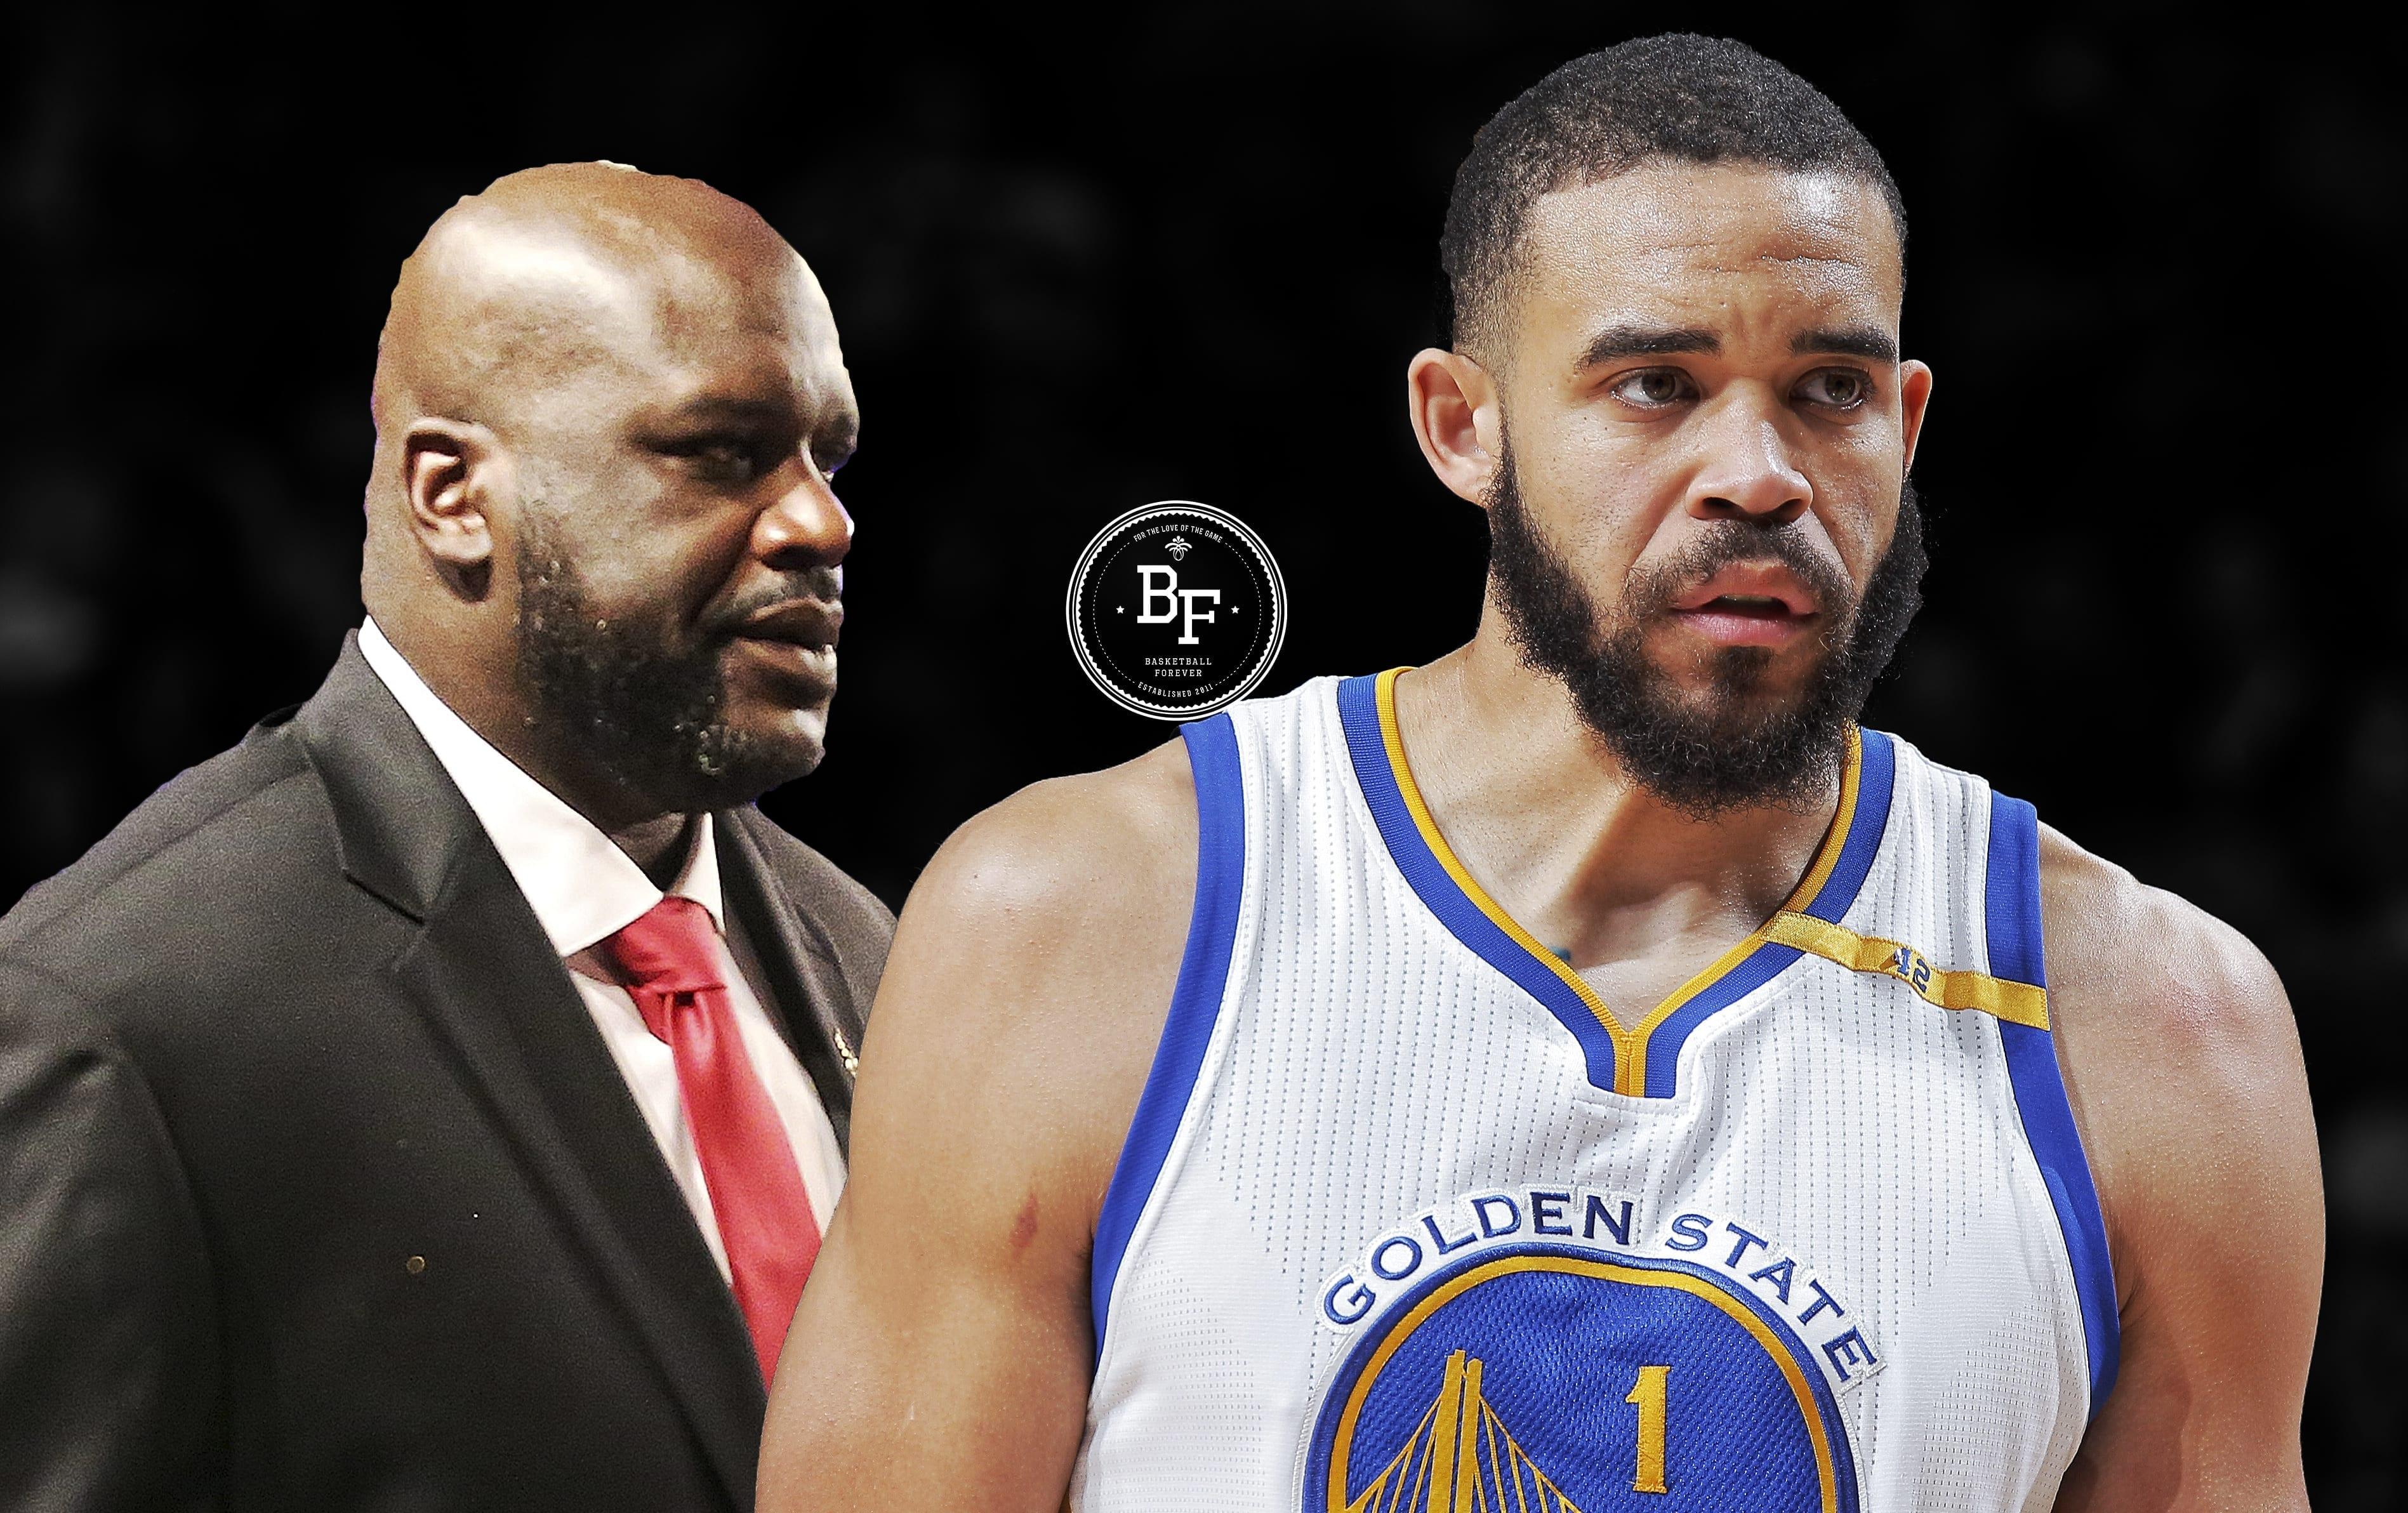 http://www.basketballforever.com/wp-content/uploads/2017/02/Javale-ya-Boy.jpg